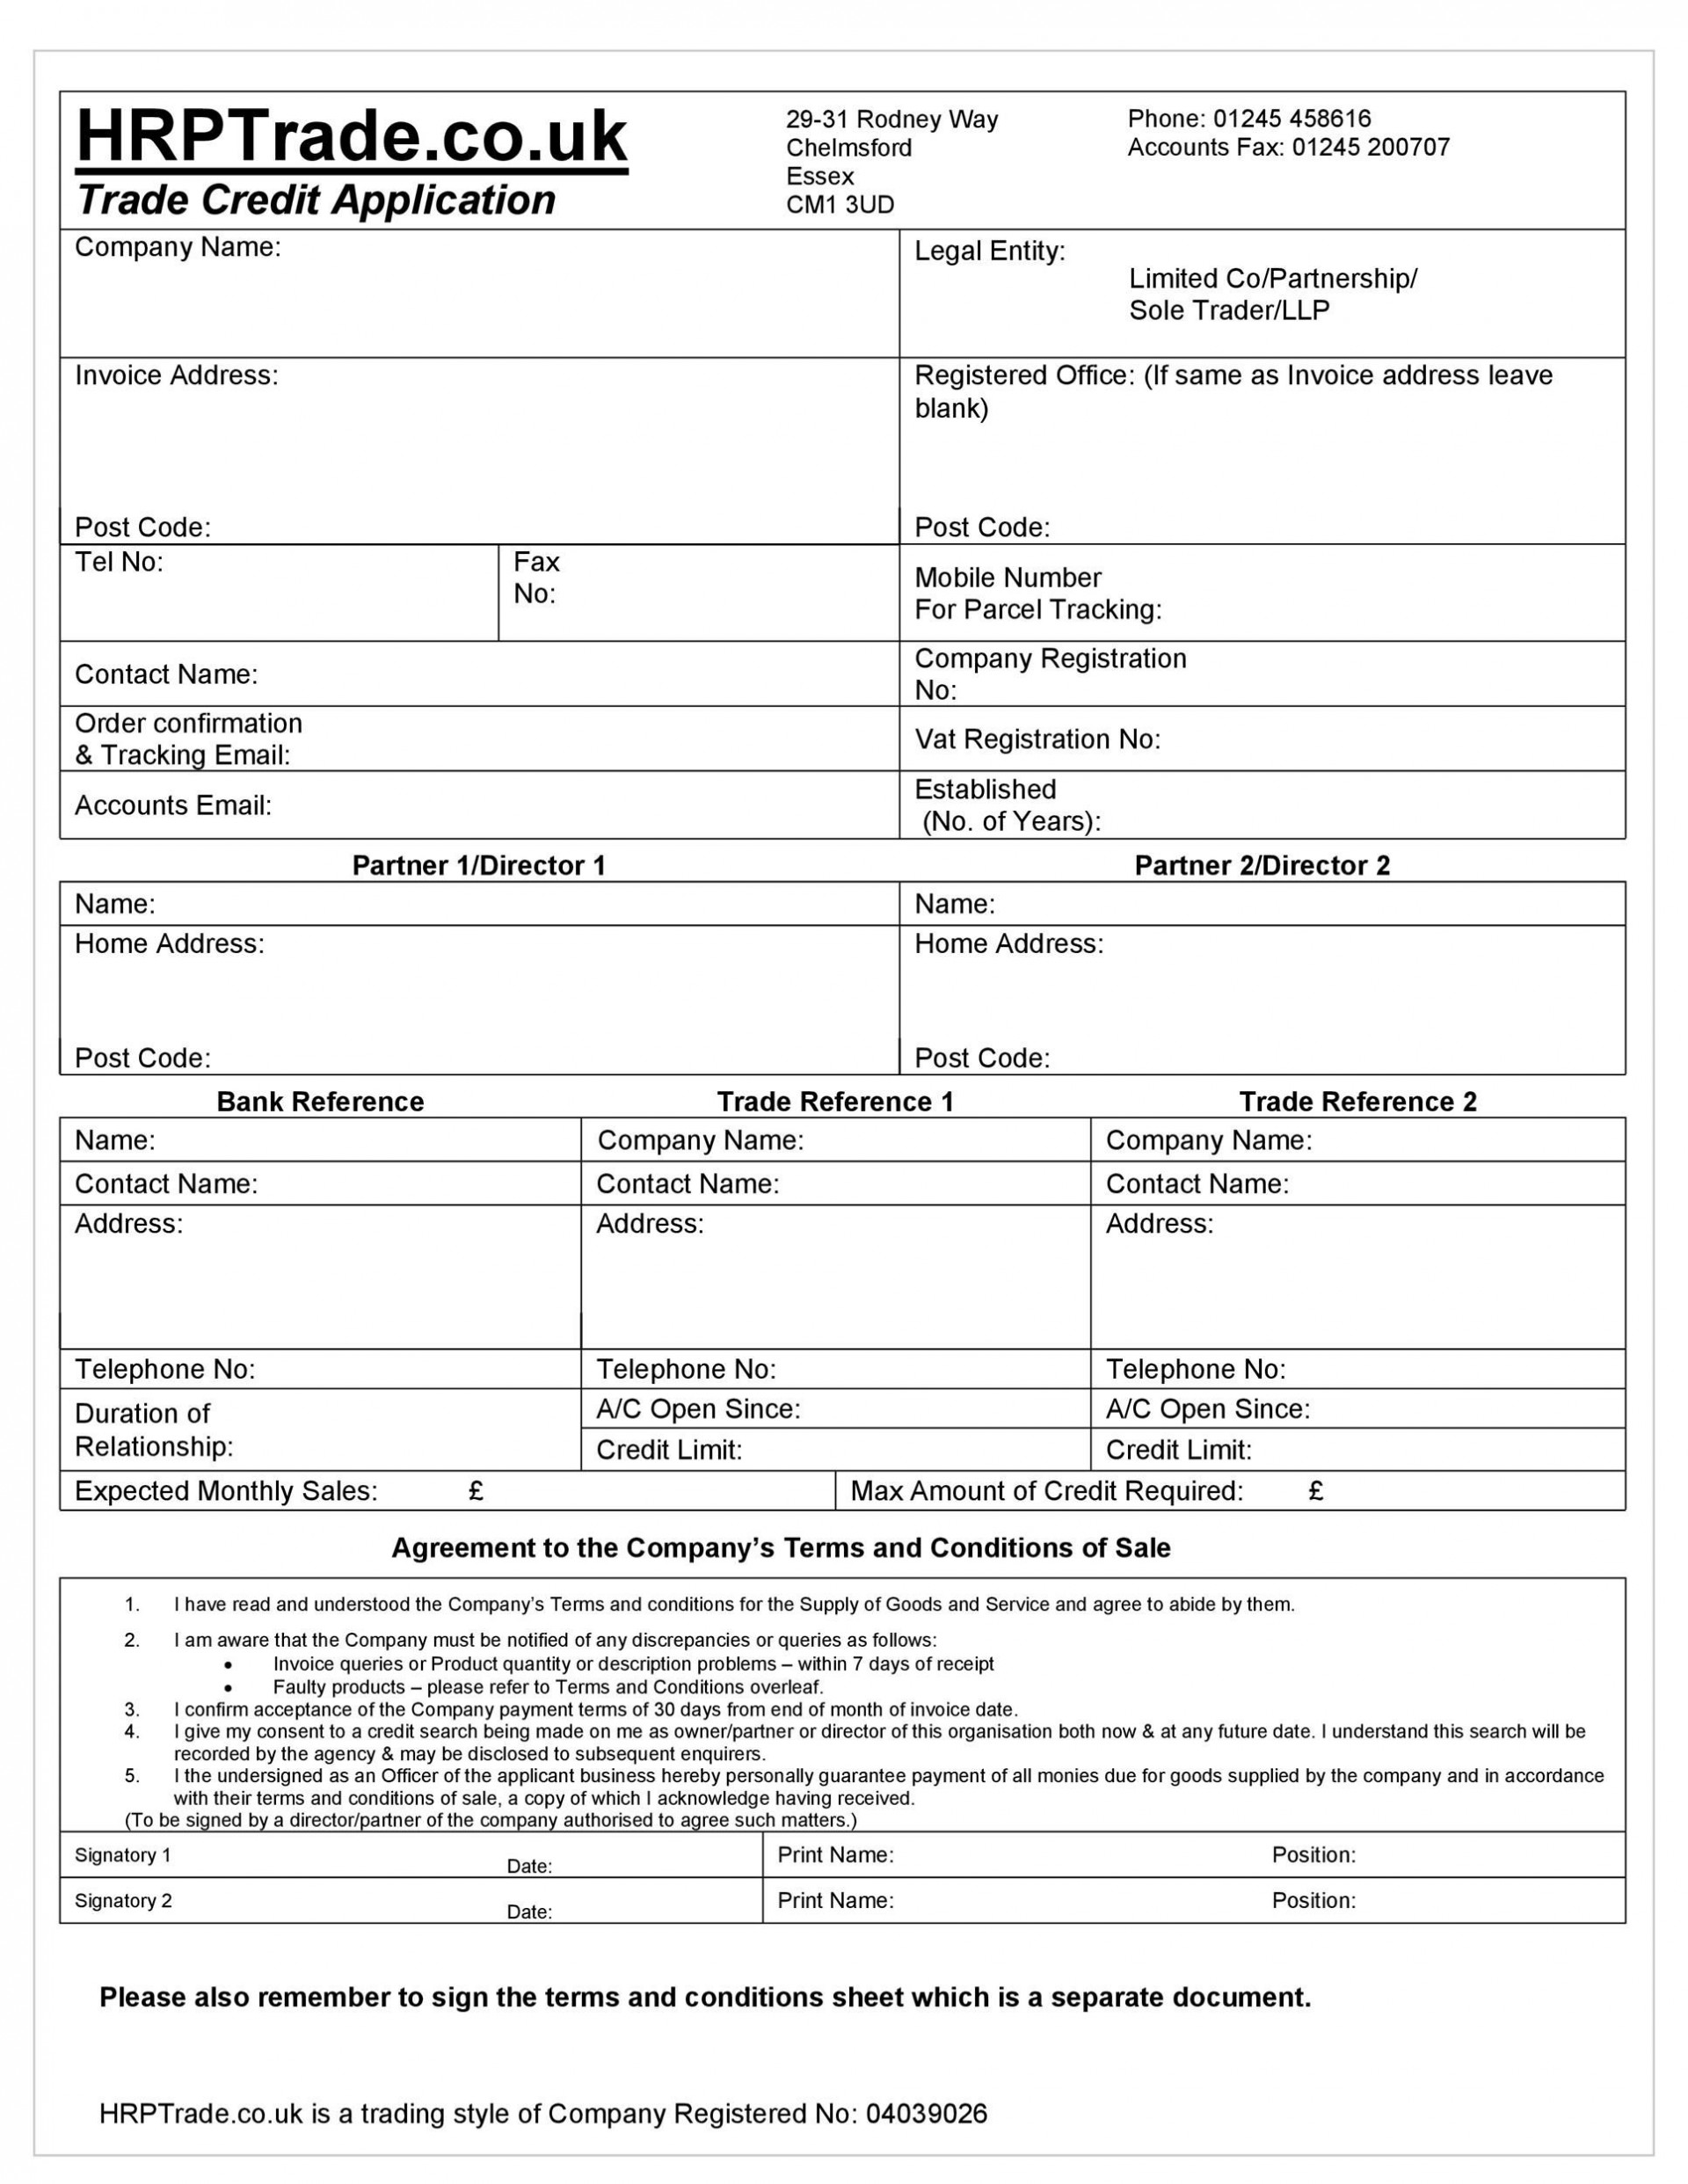 005 Remarkable Busines Credit Application Form Free Inspiration  Template1920